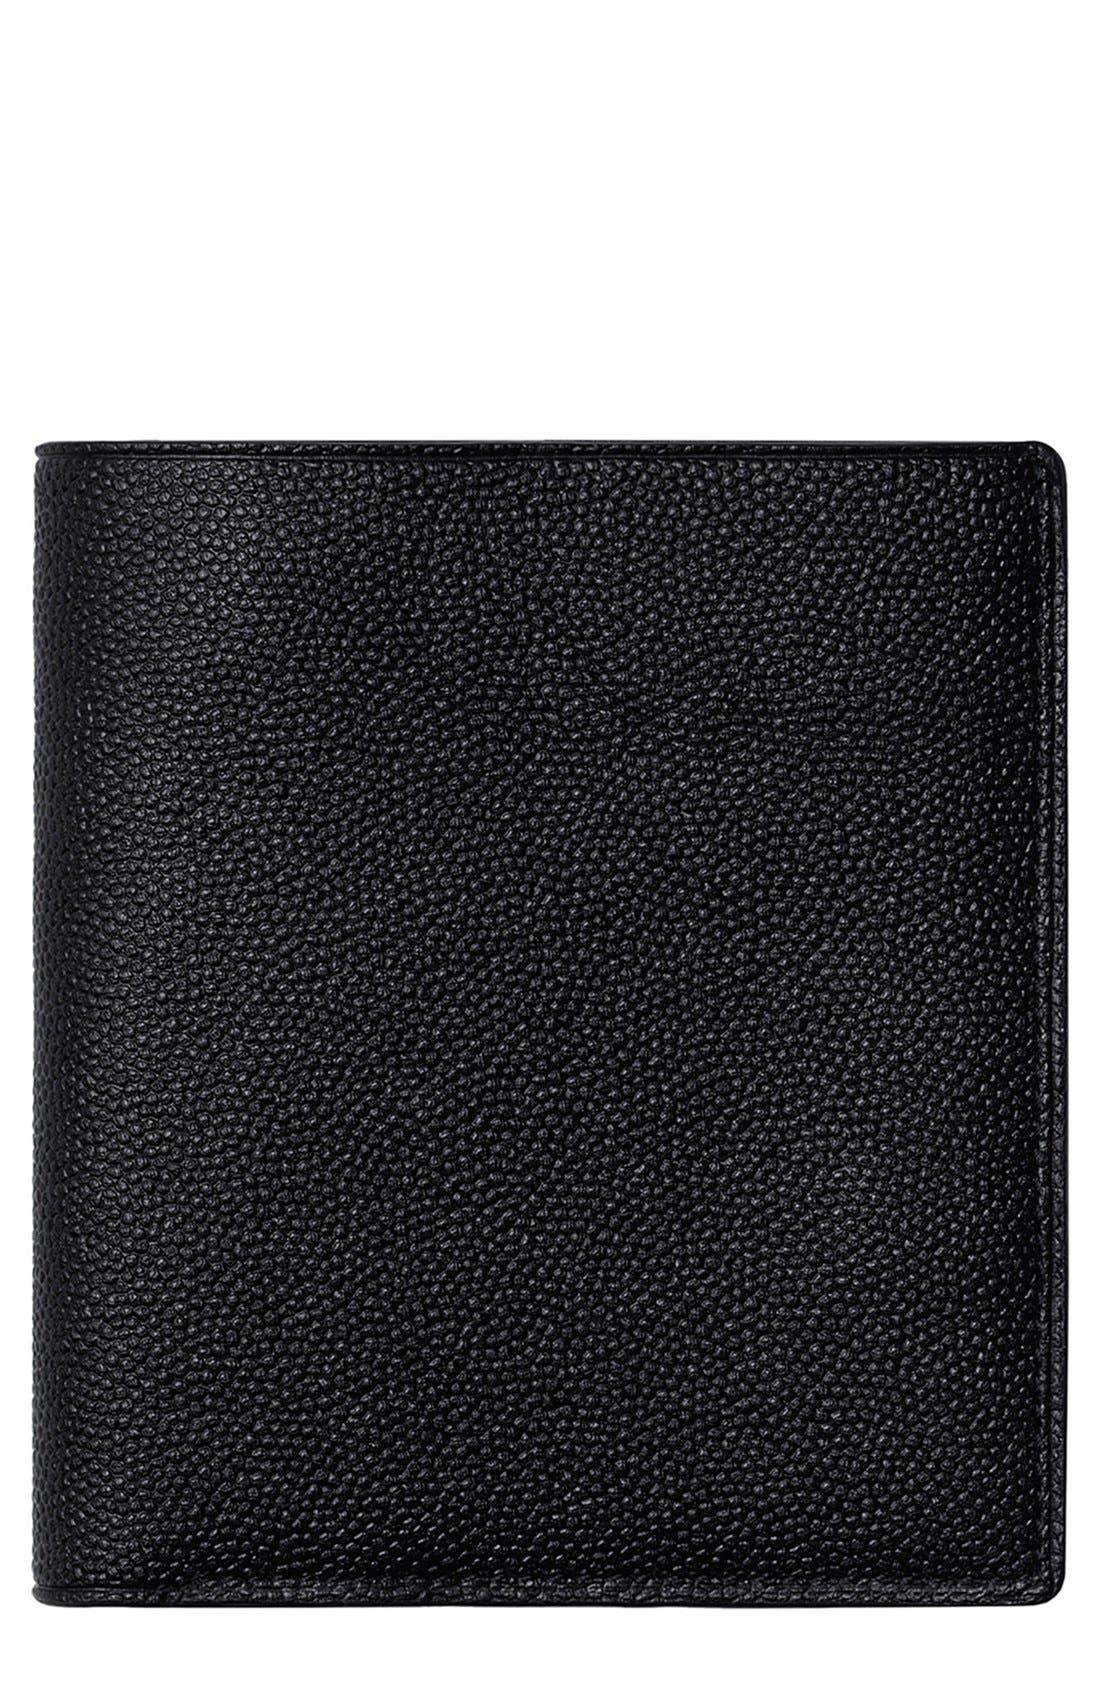 Alternate Image 1 Selected - WANT Les Essentiels de la Vie 'Bradley' Bifold Wallet